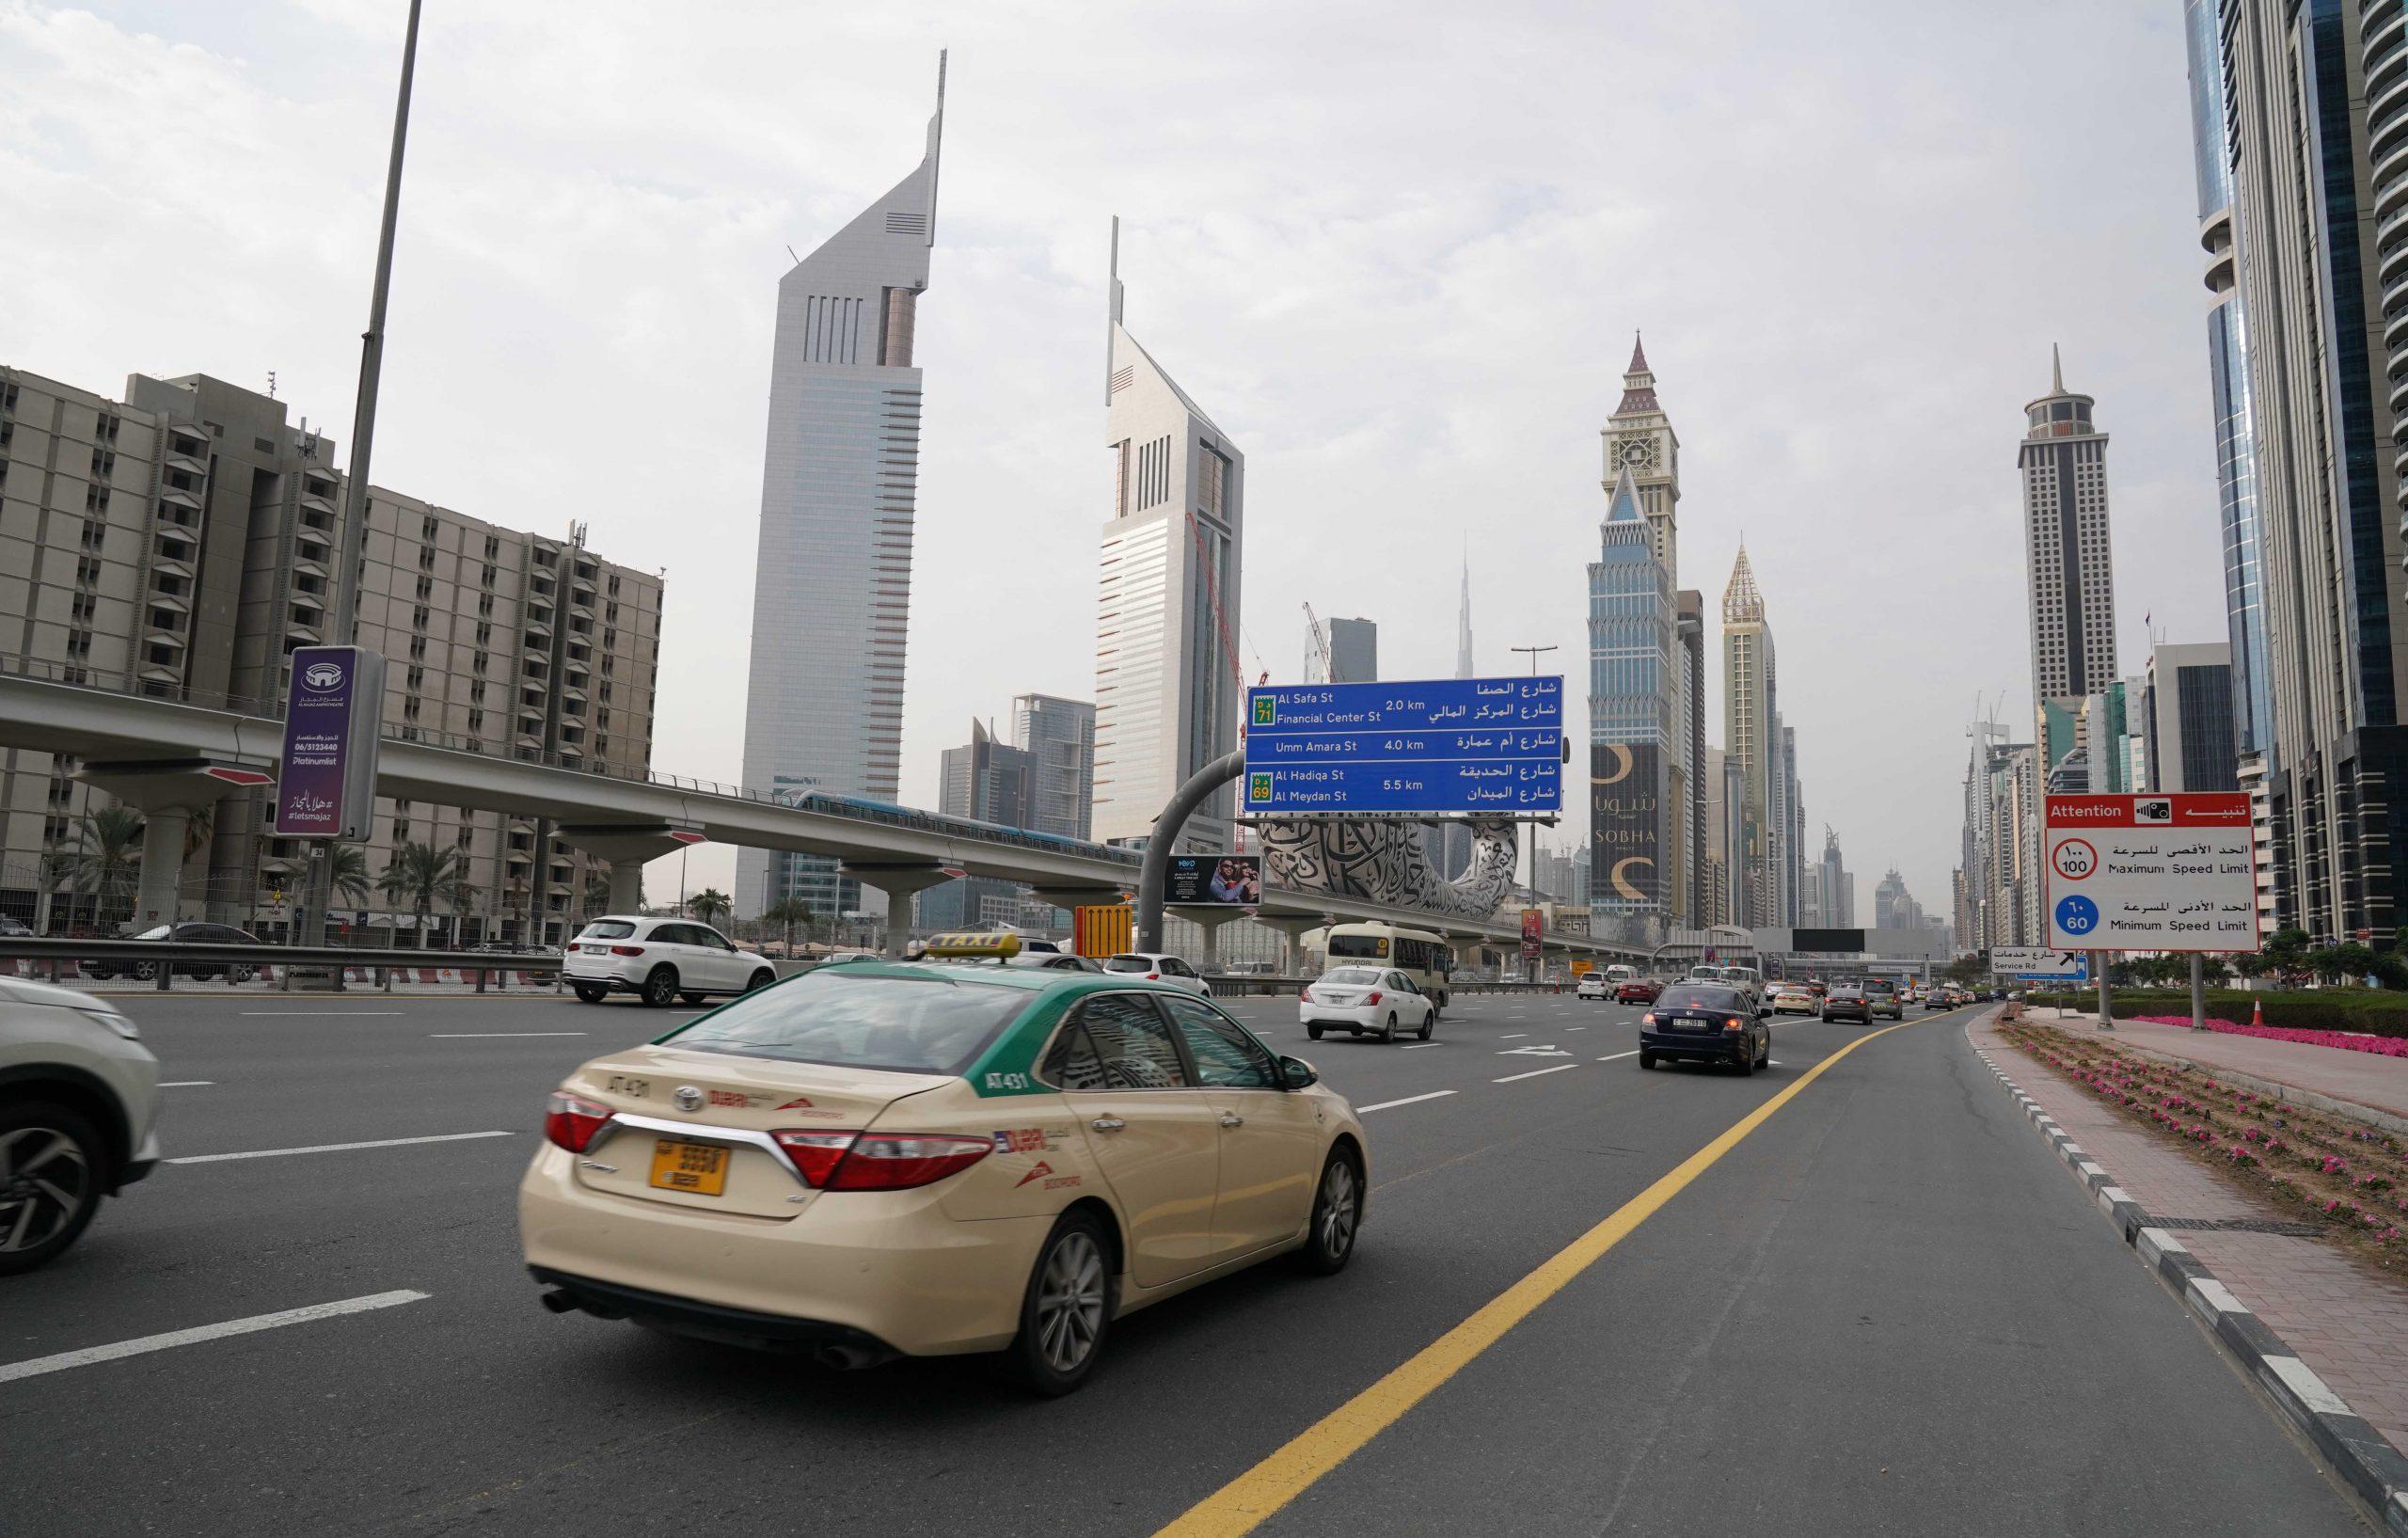 free Sheikh Zayed Road Highway image